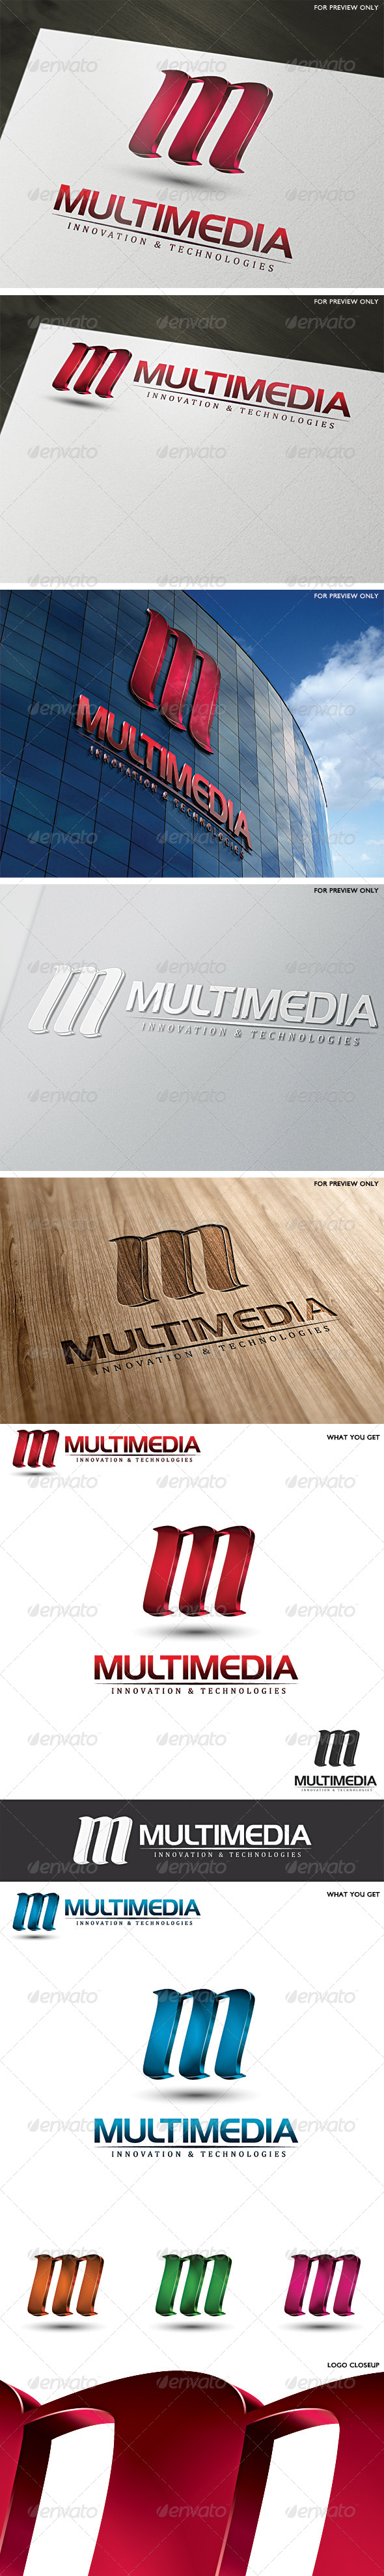 3D Multimedia Letter M Logo Template - Letters Logo Templates